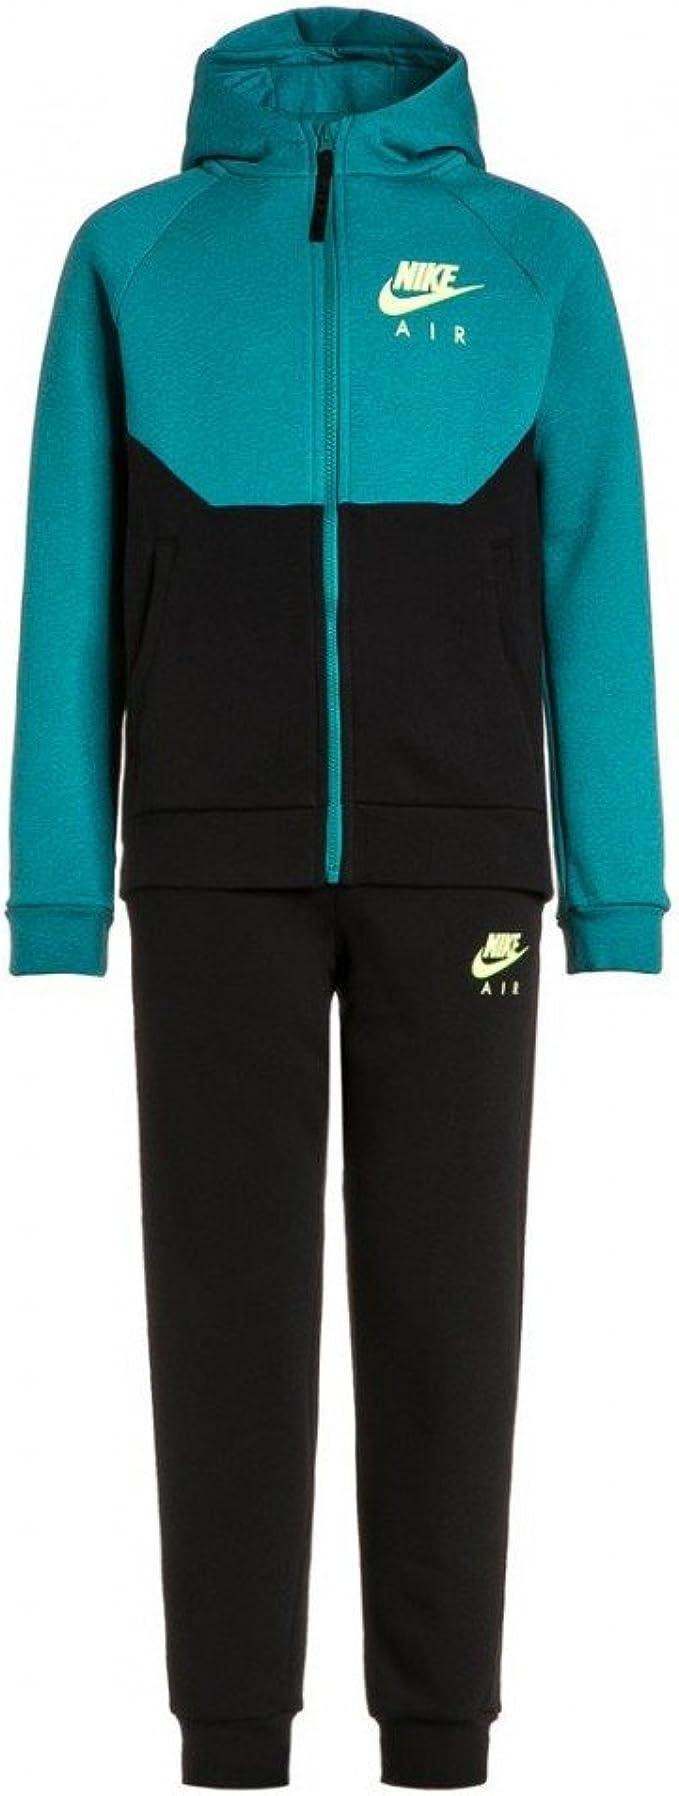 Nike B NSW TRK Suit Air Chándal, Niños: Amazon.es: Ropa y ...